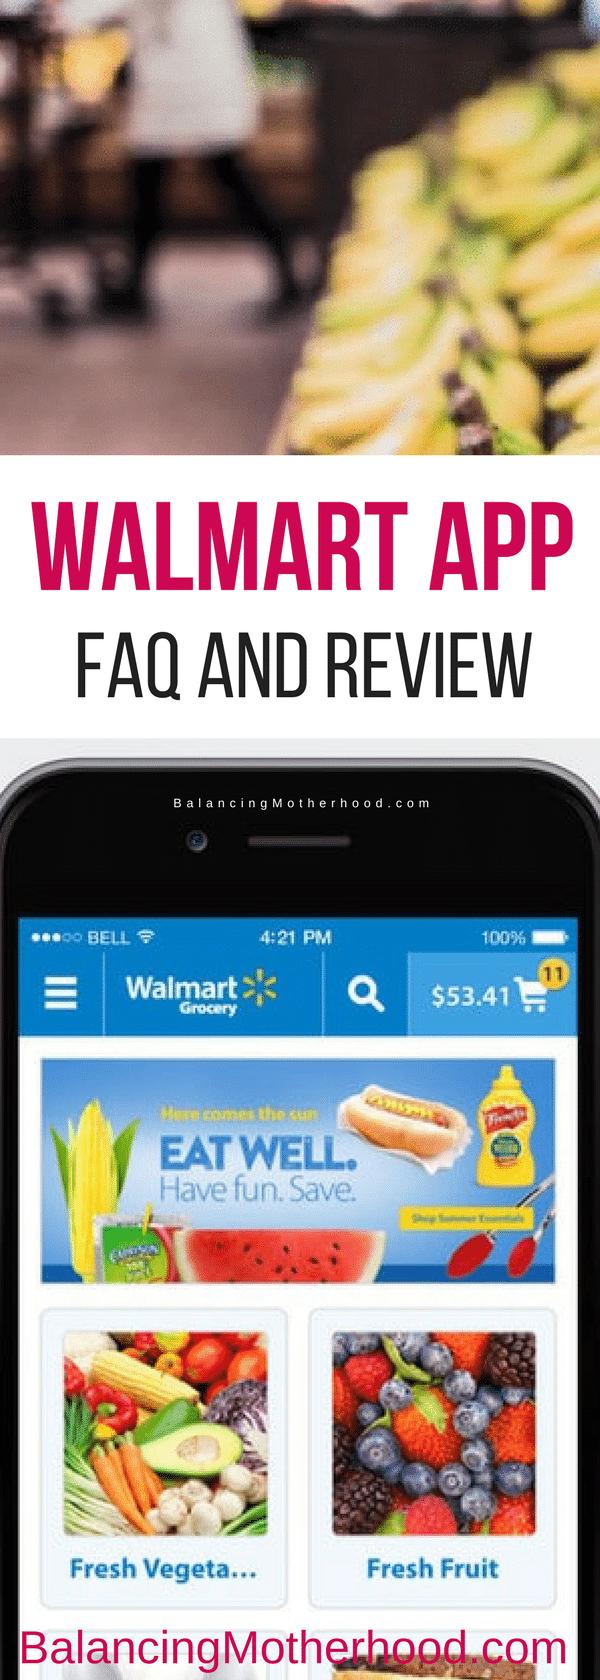 Walmart App Review and FAQ